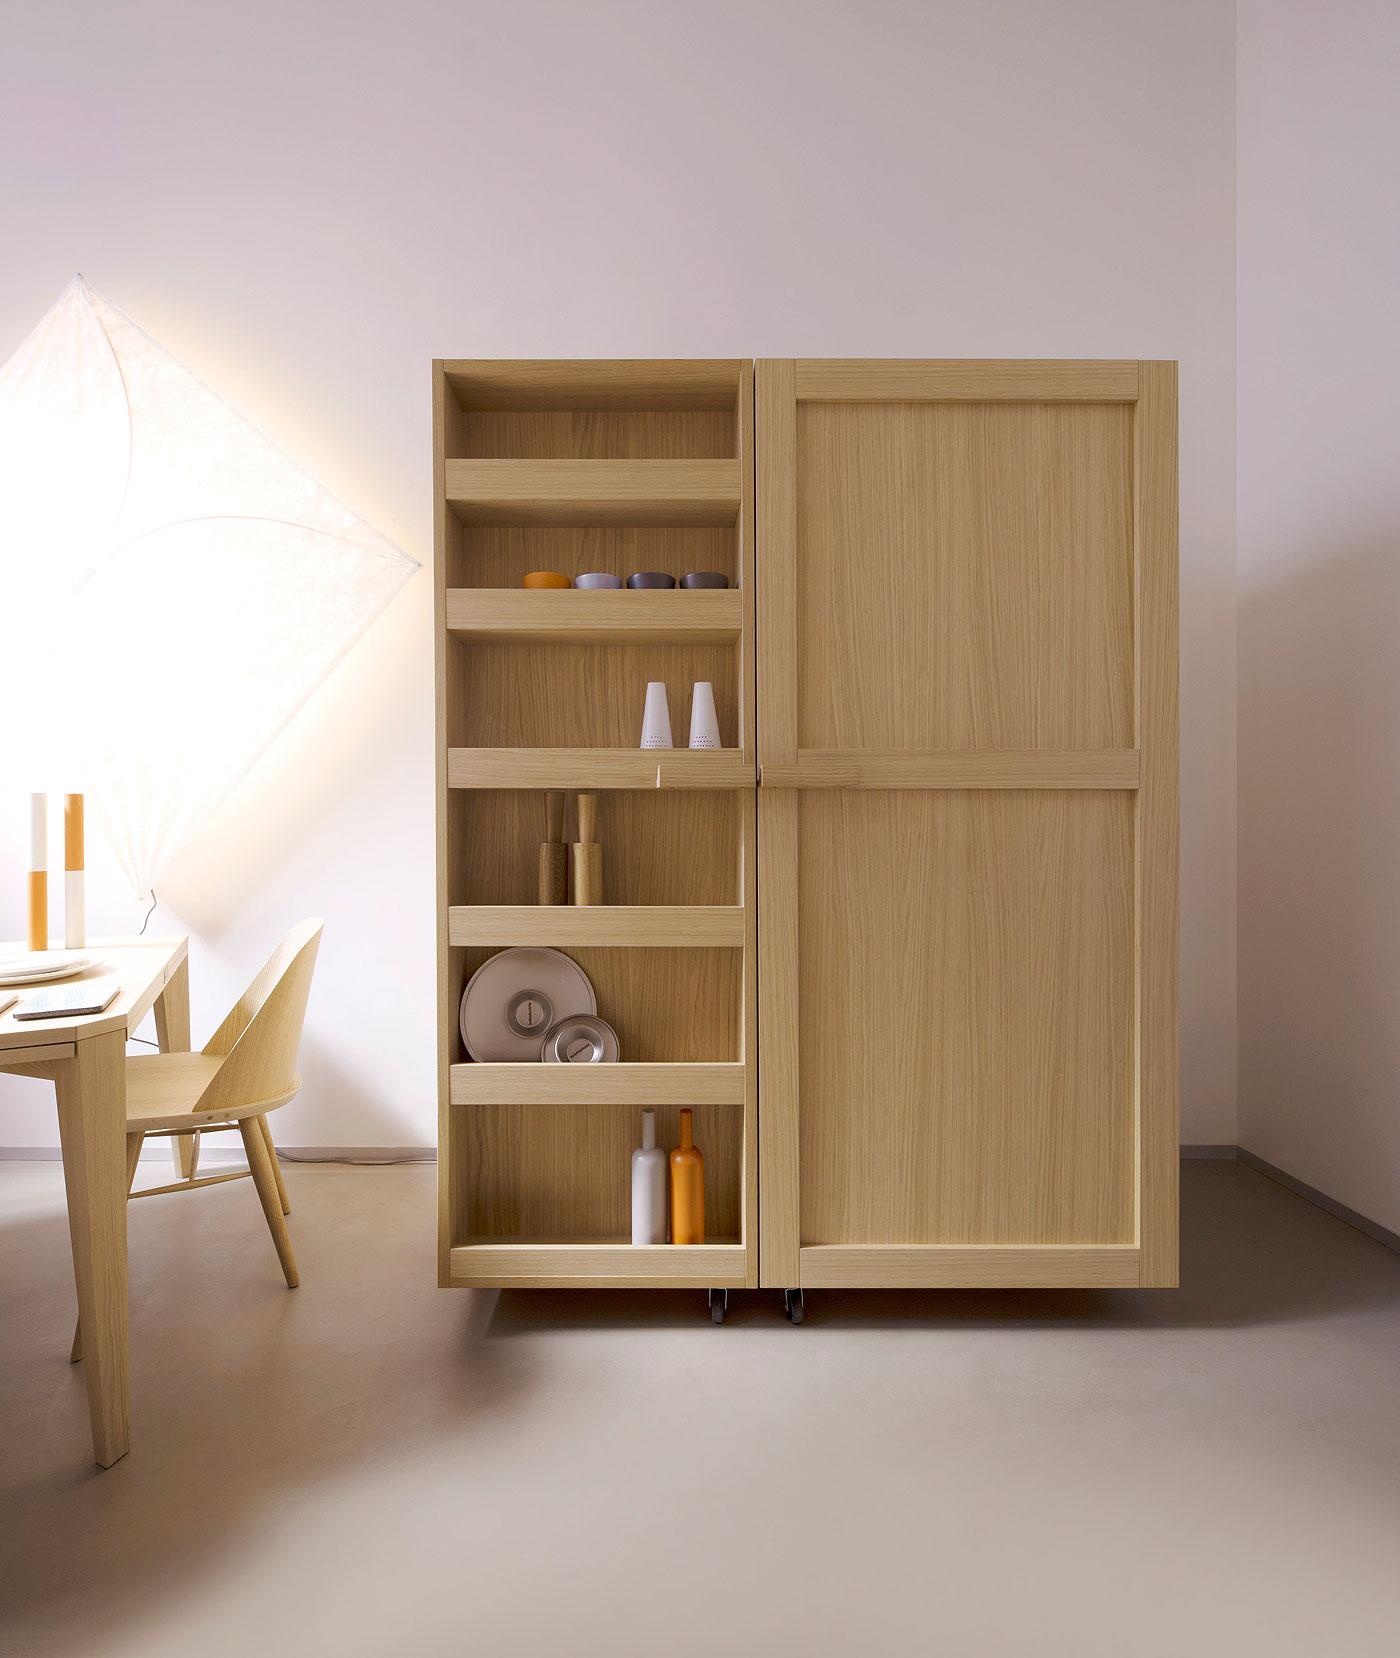 Alacena contempor nea en madera de roble de key cucine for Muebles de cocina para montar